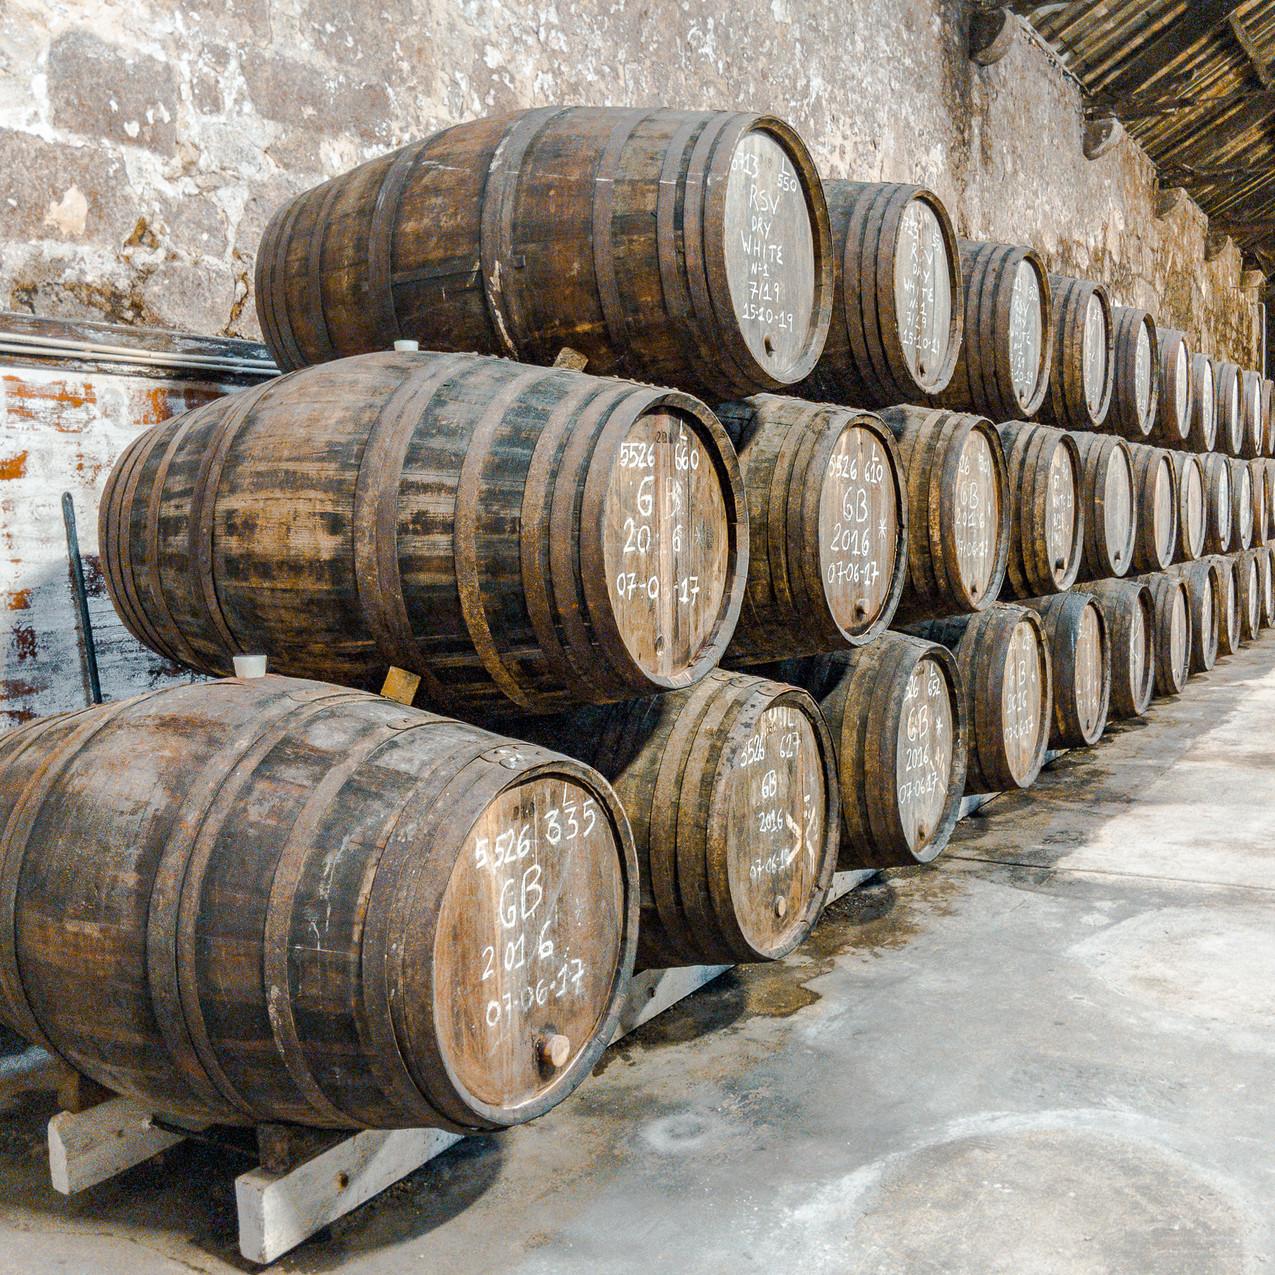 Port Barrels in Aging Room